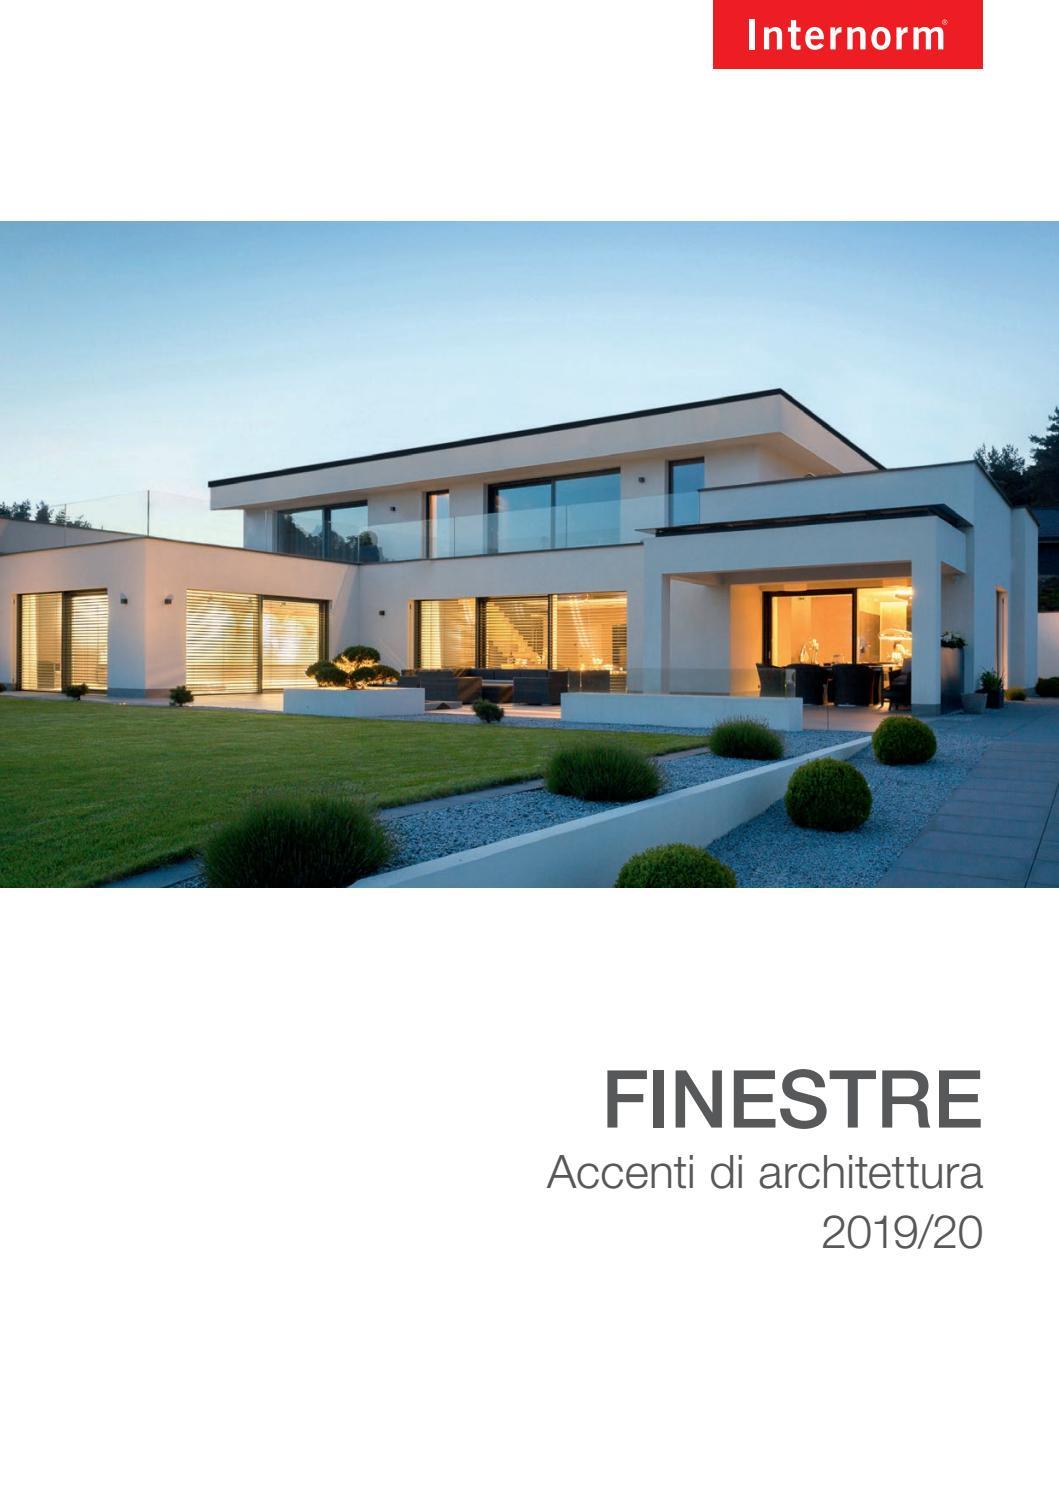 Sistema Di Oscuramento Per Finestre fensterbuch ita by internorm windows & doors - issuu